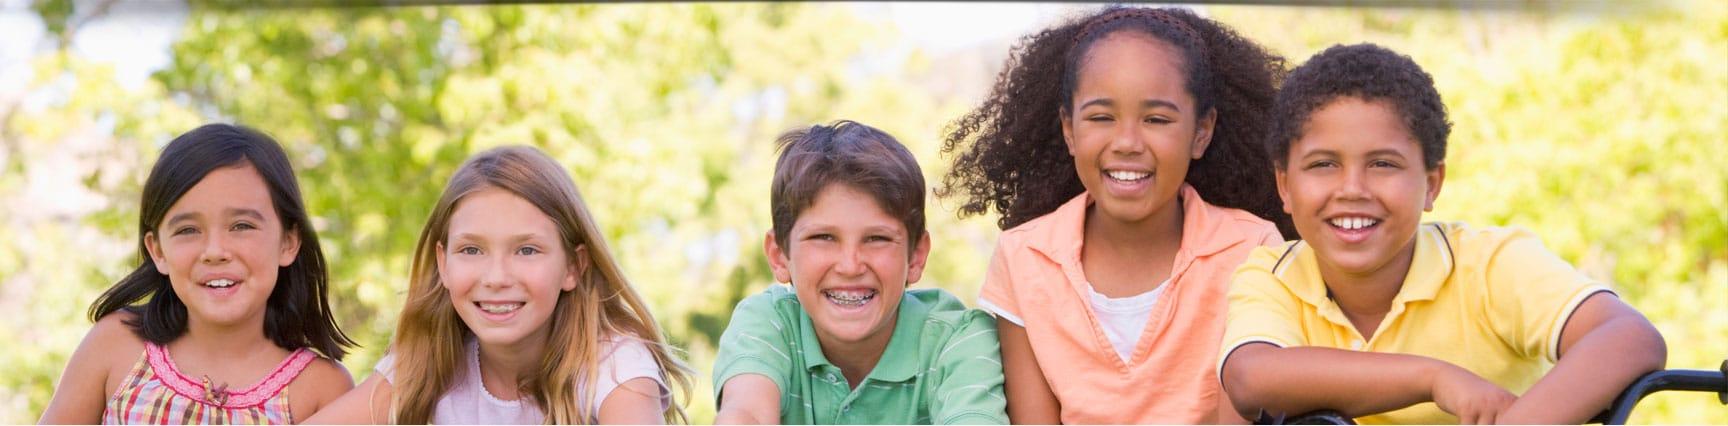 Orthodontics-of-San-Mateo-Dr-Krista-Hirasuna-Dr-Albert-Landucci-Slide-03